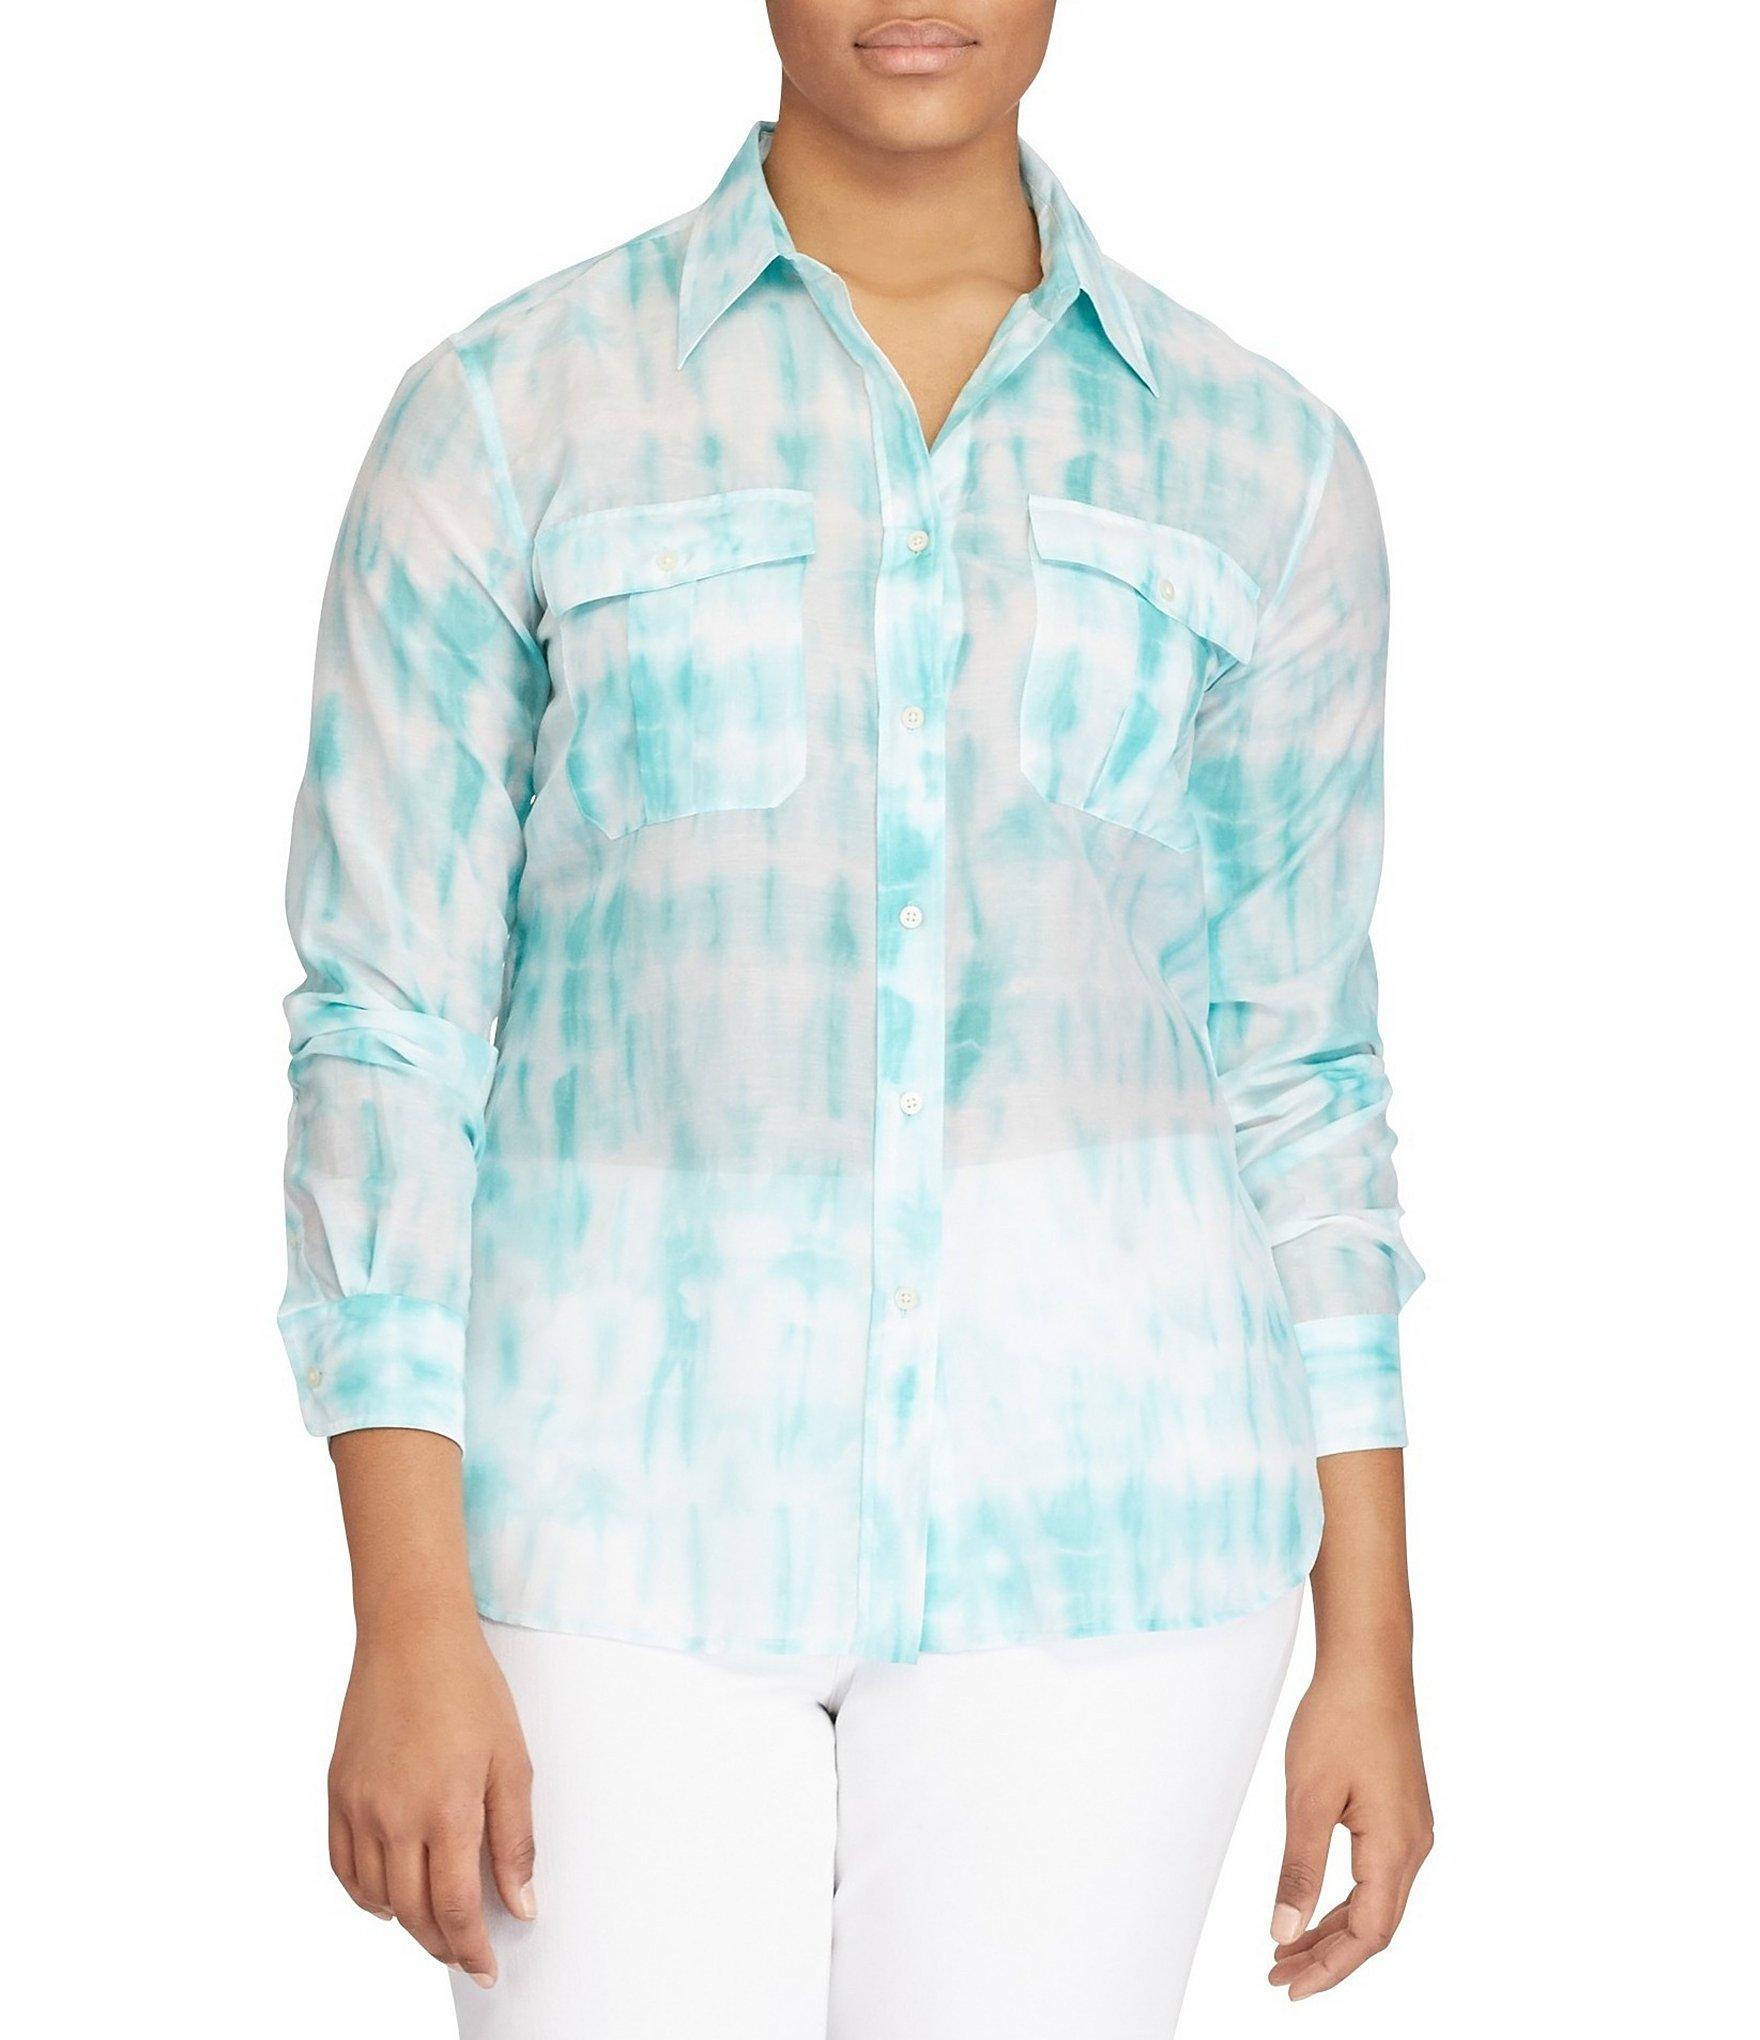 Lauren by Ralph Lauren. Women's Blue Plus Tie-dye Button-down Shirt